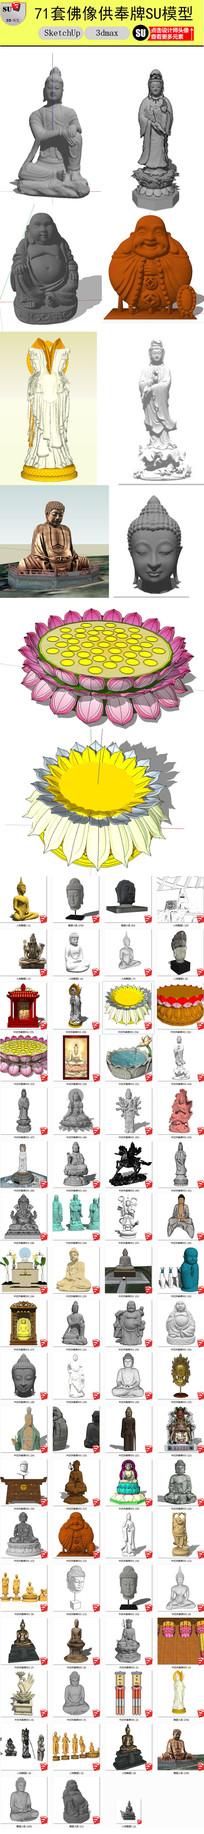 寺庙佛像菩萨SU